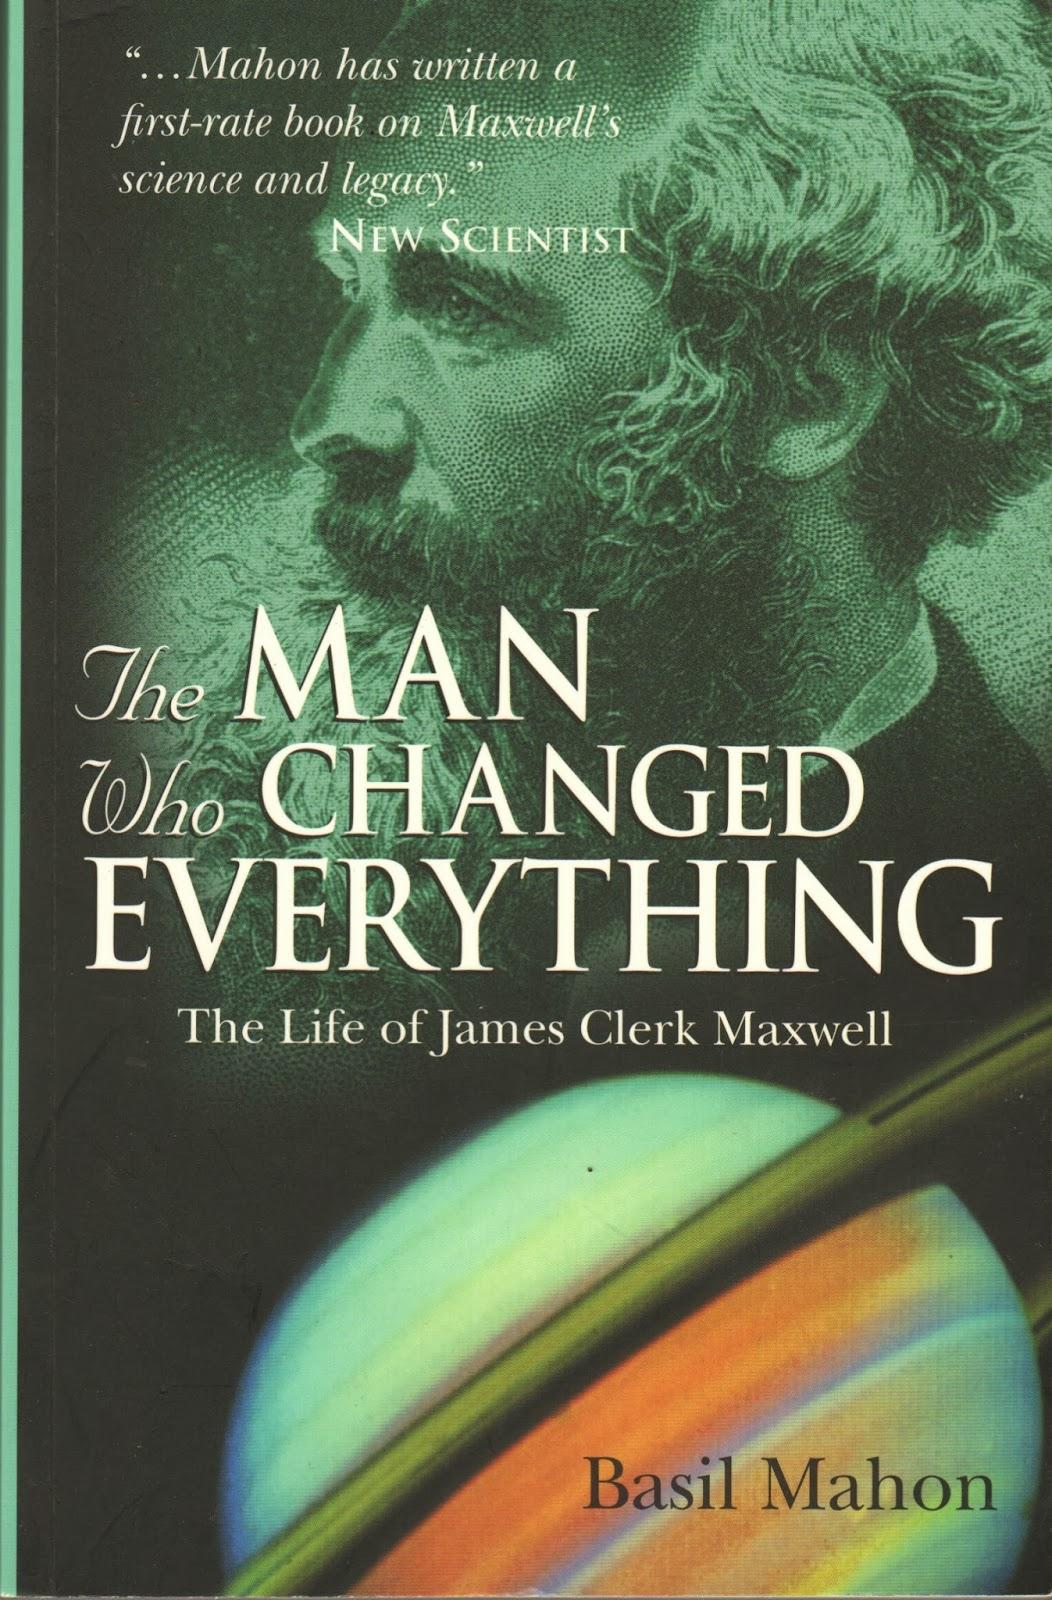 james clerk maxwell biographie